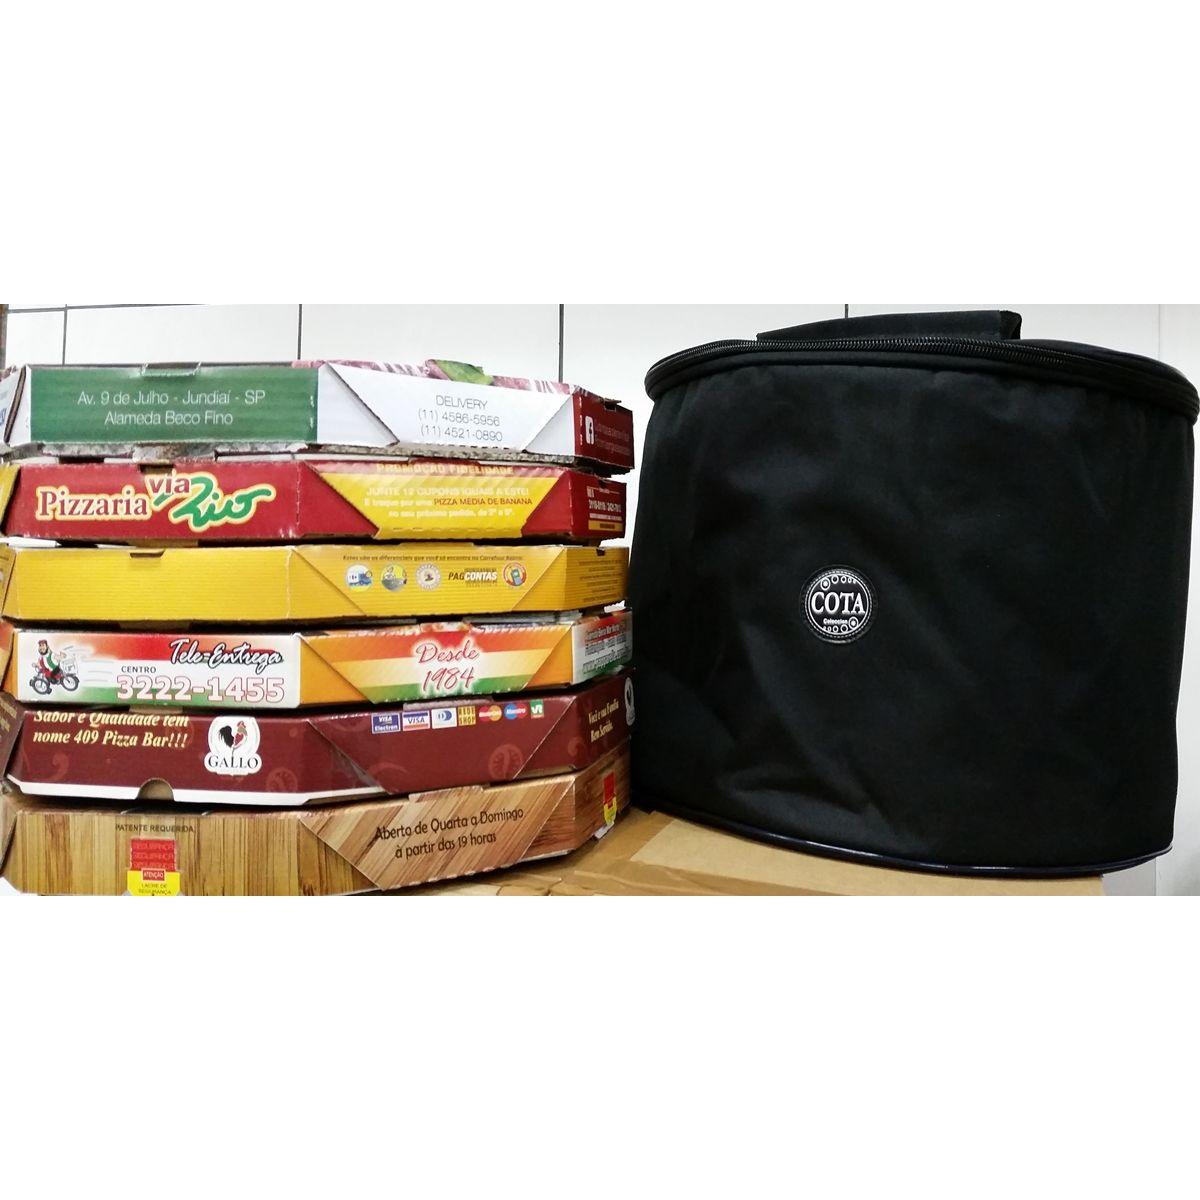 TERMO BAG DE 35 CM FORMATO REDONDO   .P/05 PIZZAS  - F�rum de Pizzas Vendas online